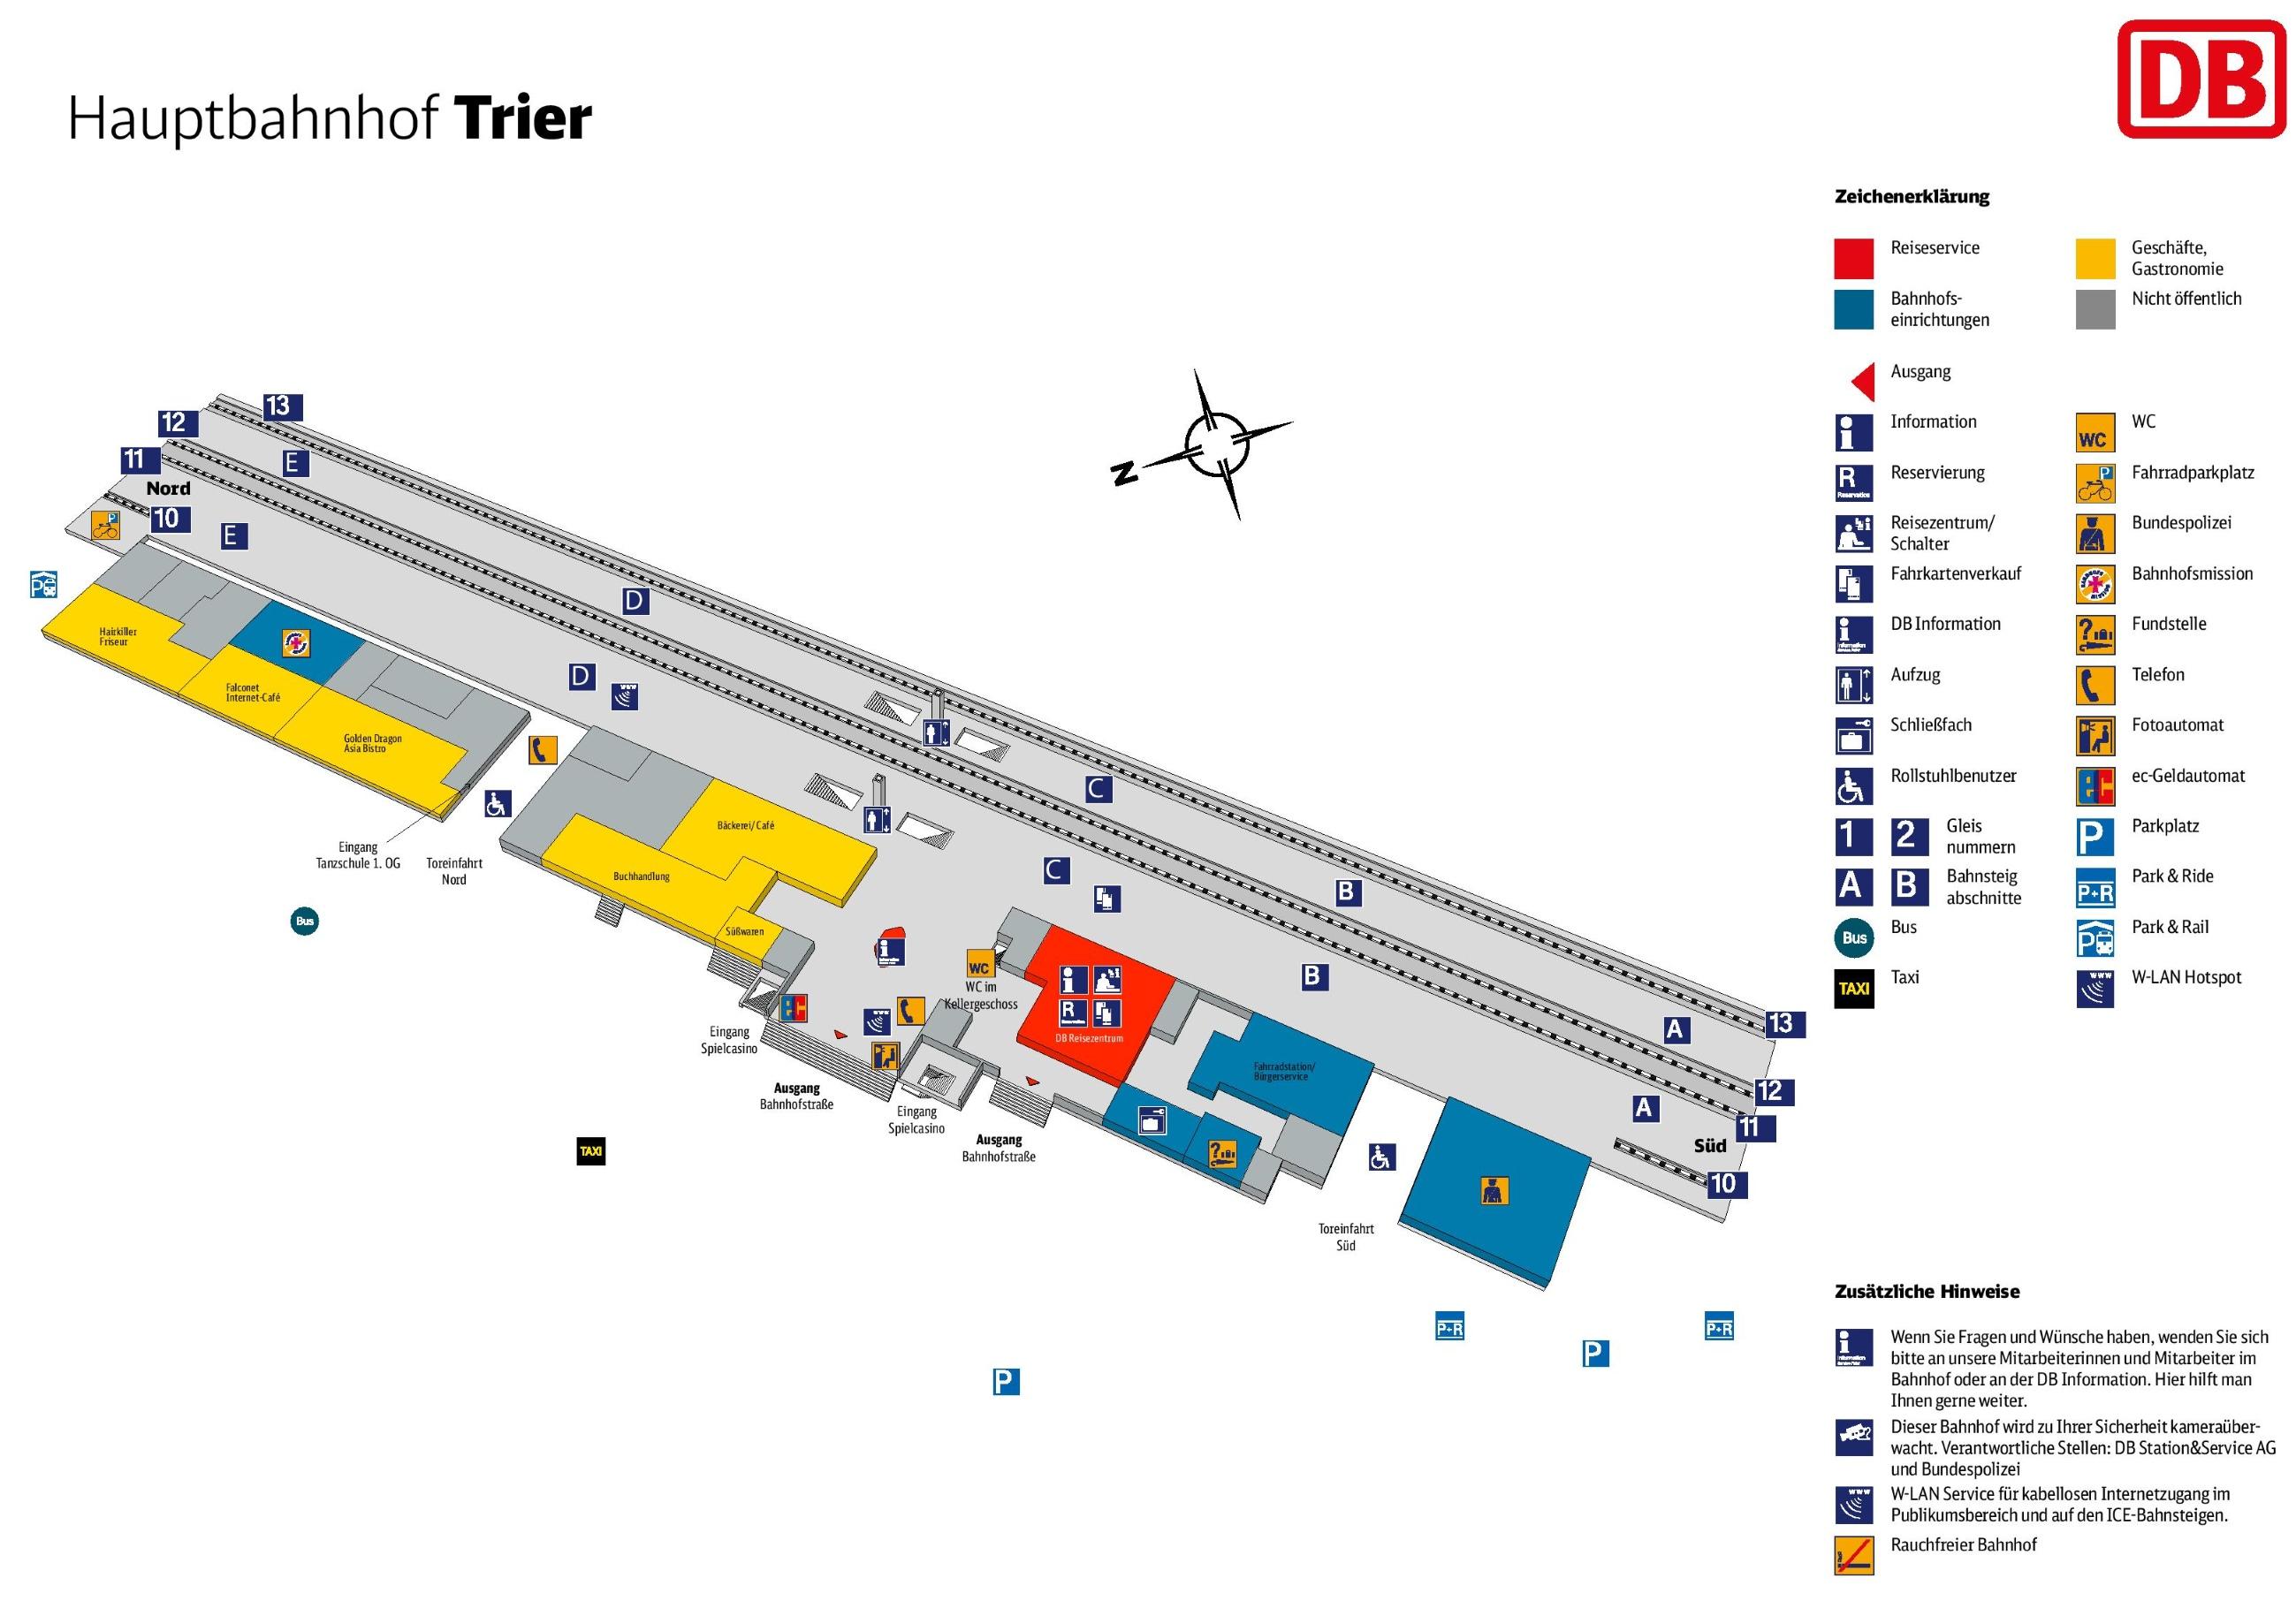 Trier hauptbahnhof map